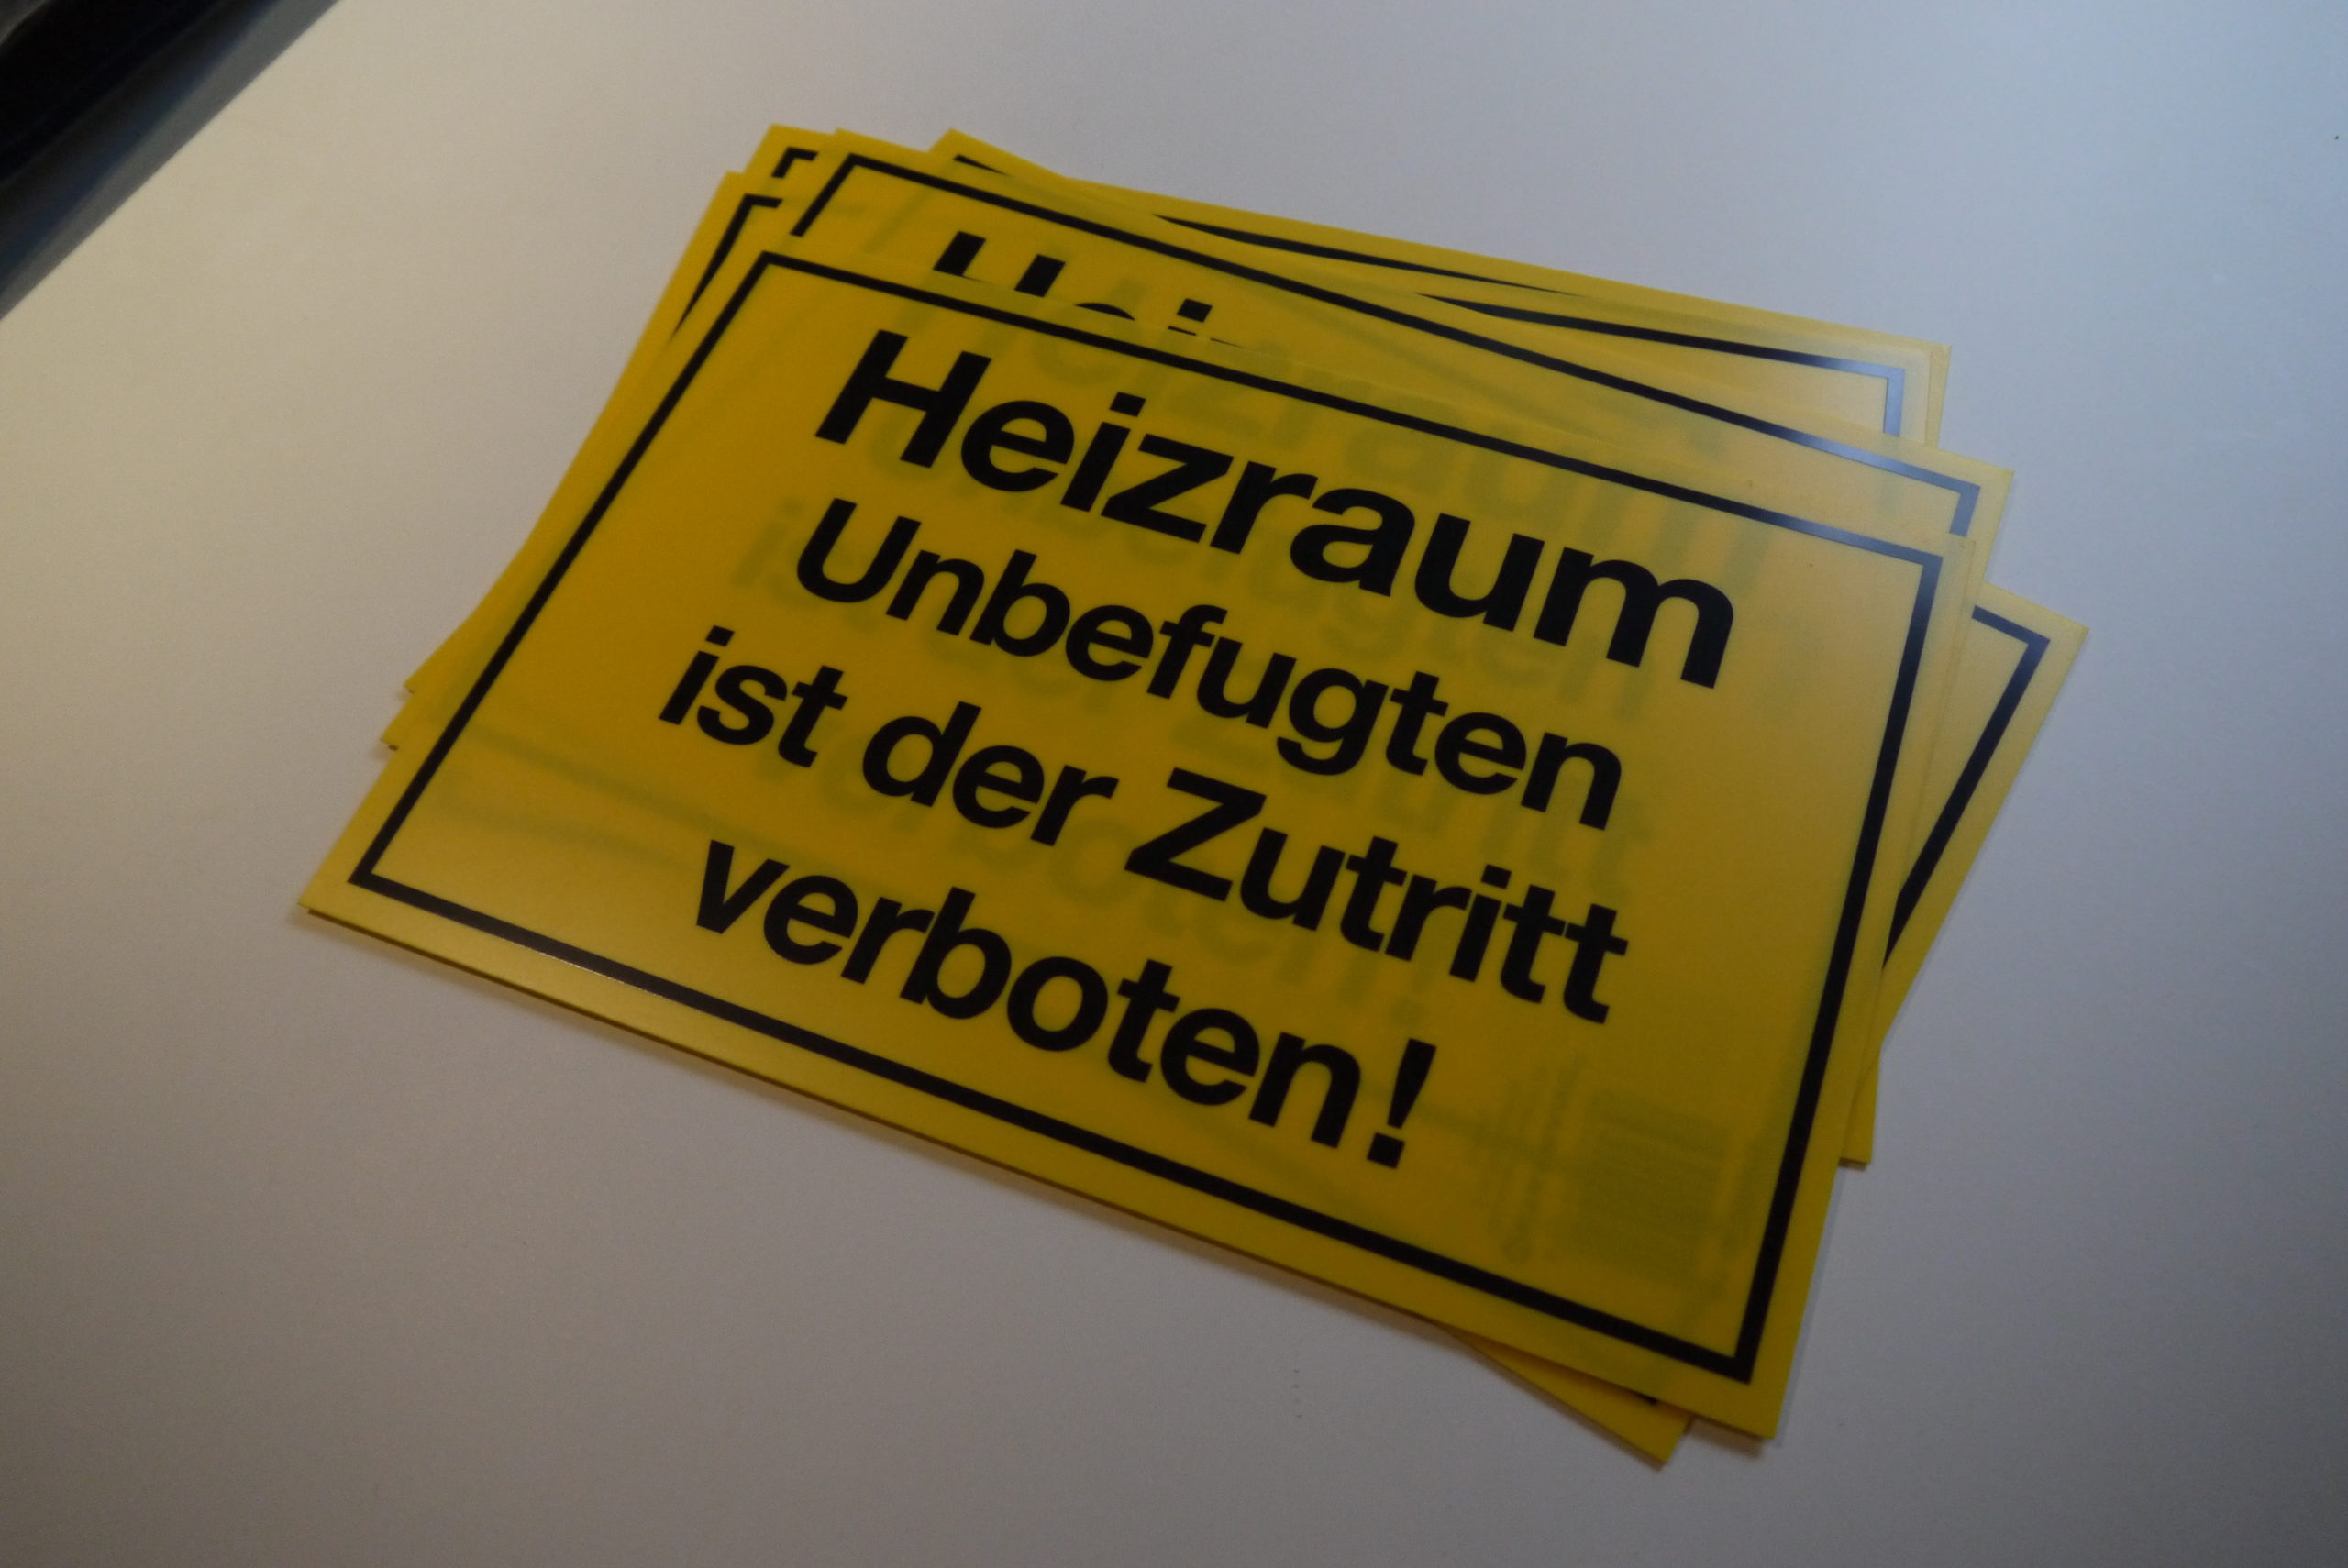 Schild - Heizraum, Unbefugten ist der Zutritt verboten